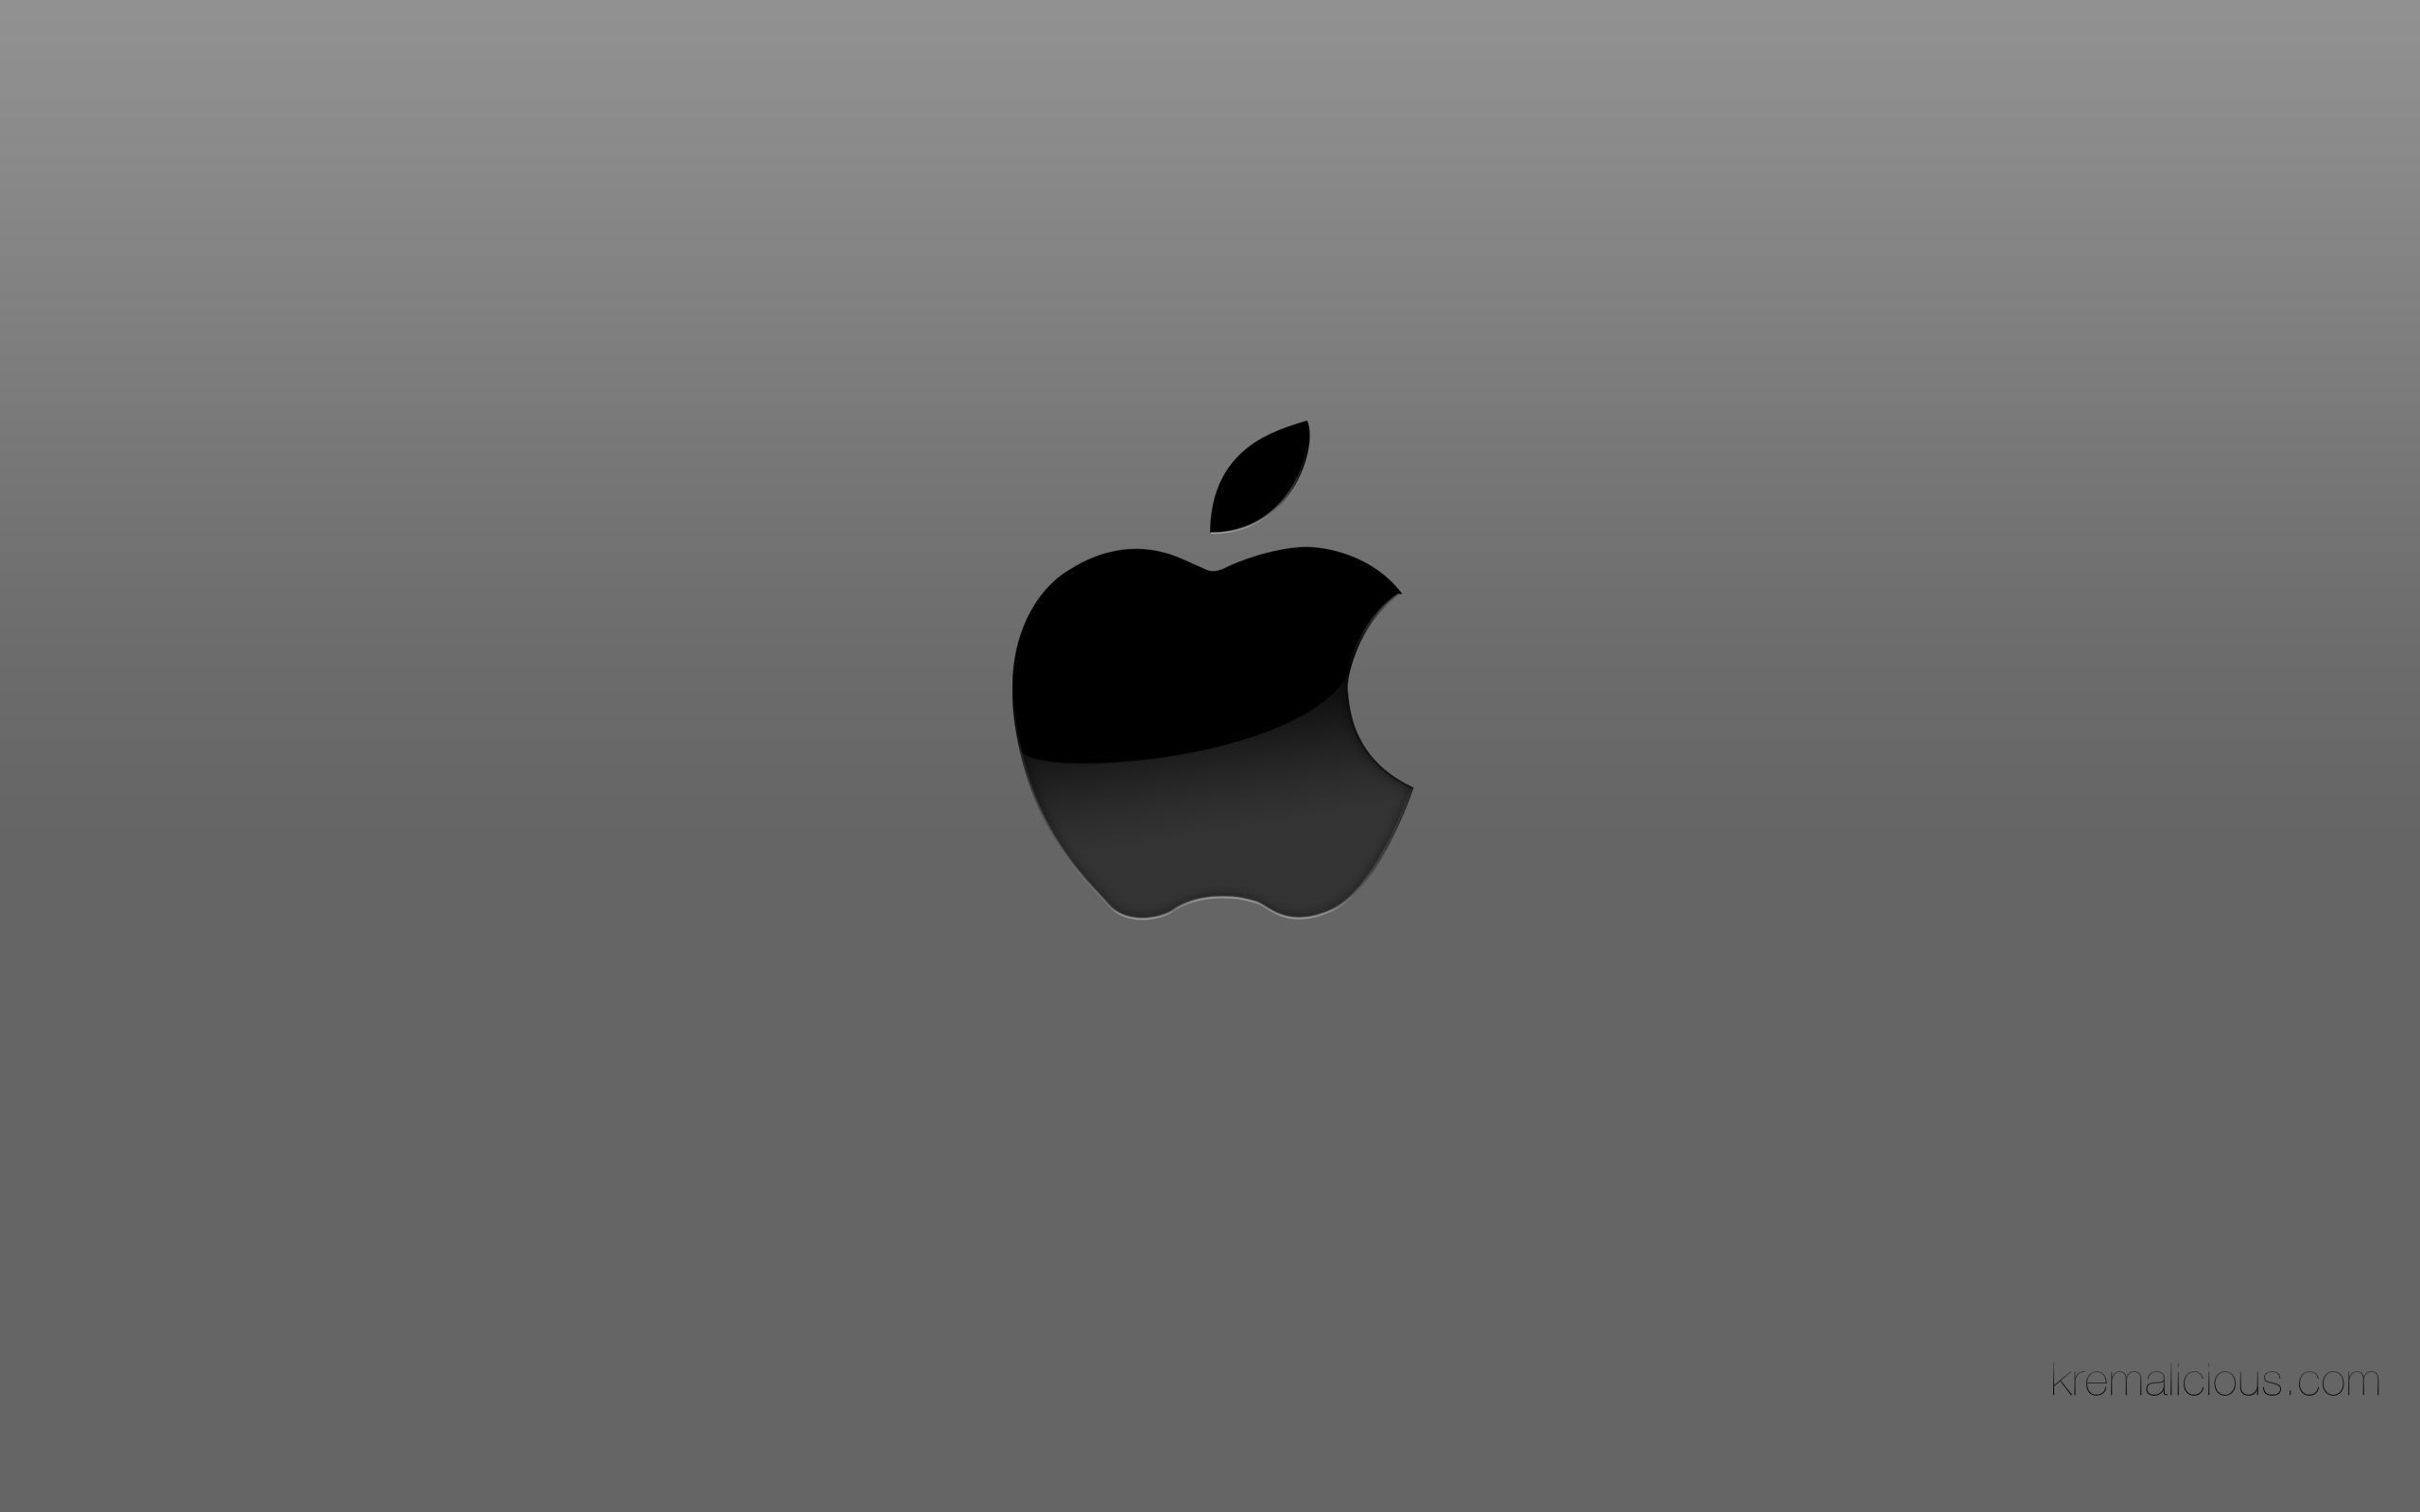 Hd wallpaper macbook - Best Ideas About Apple Wallpaper On Pinterest Apple